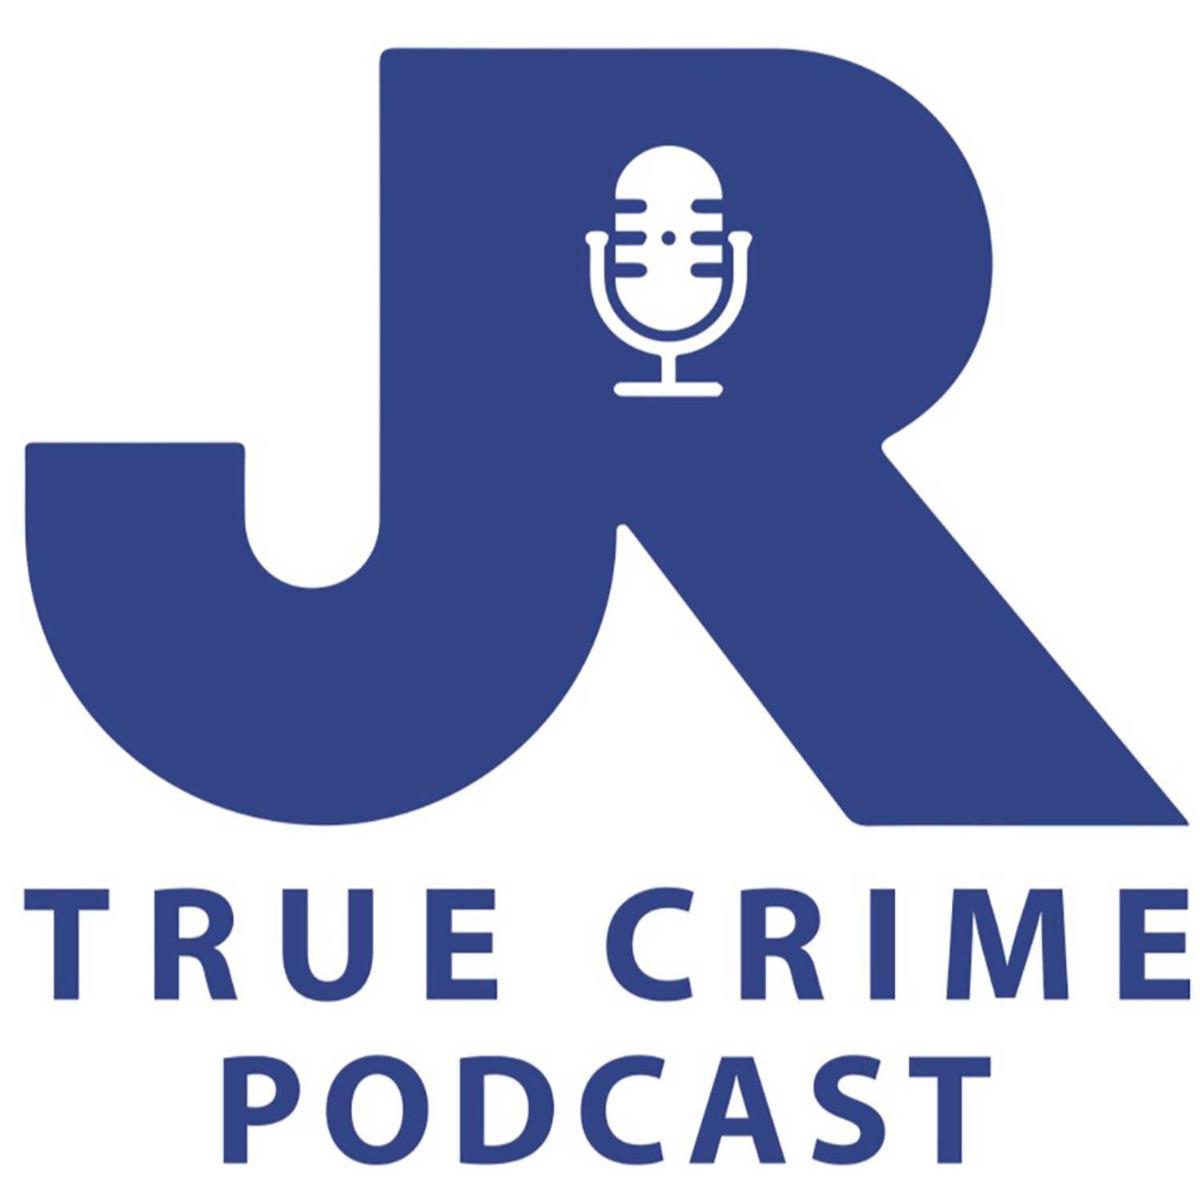 JR True Crime Podcast